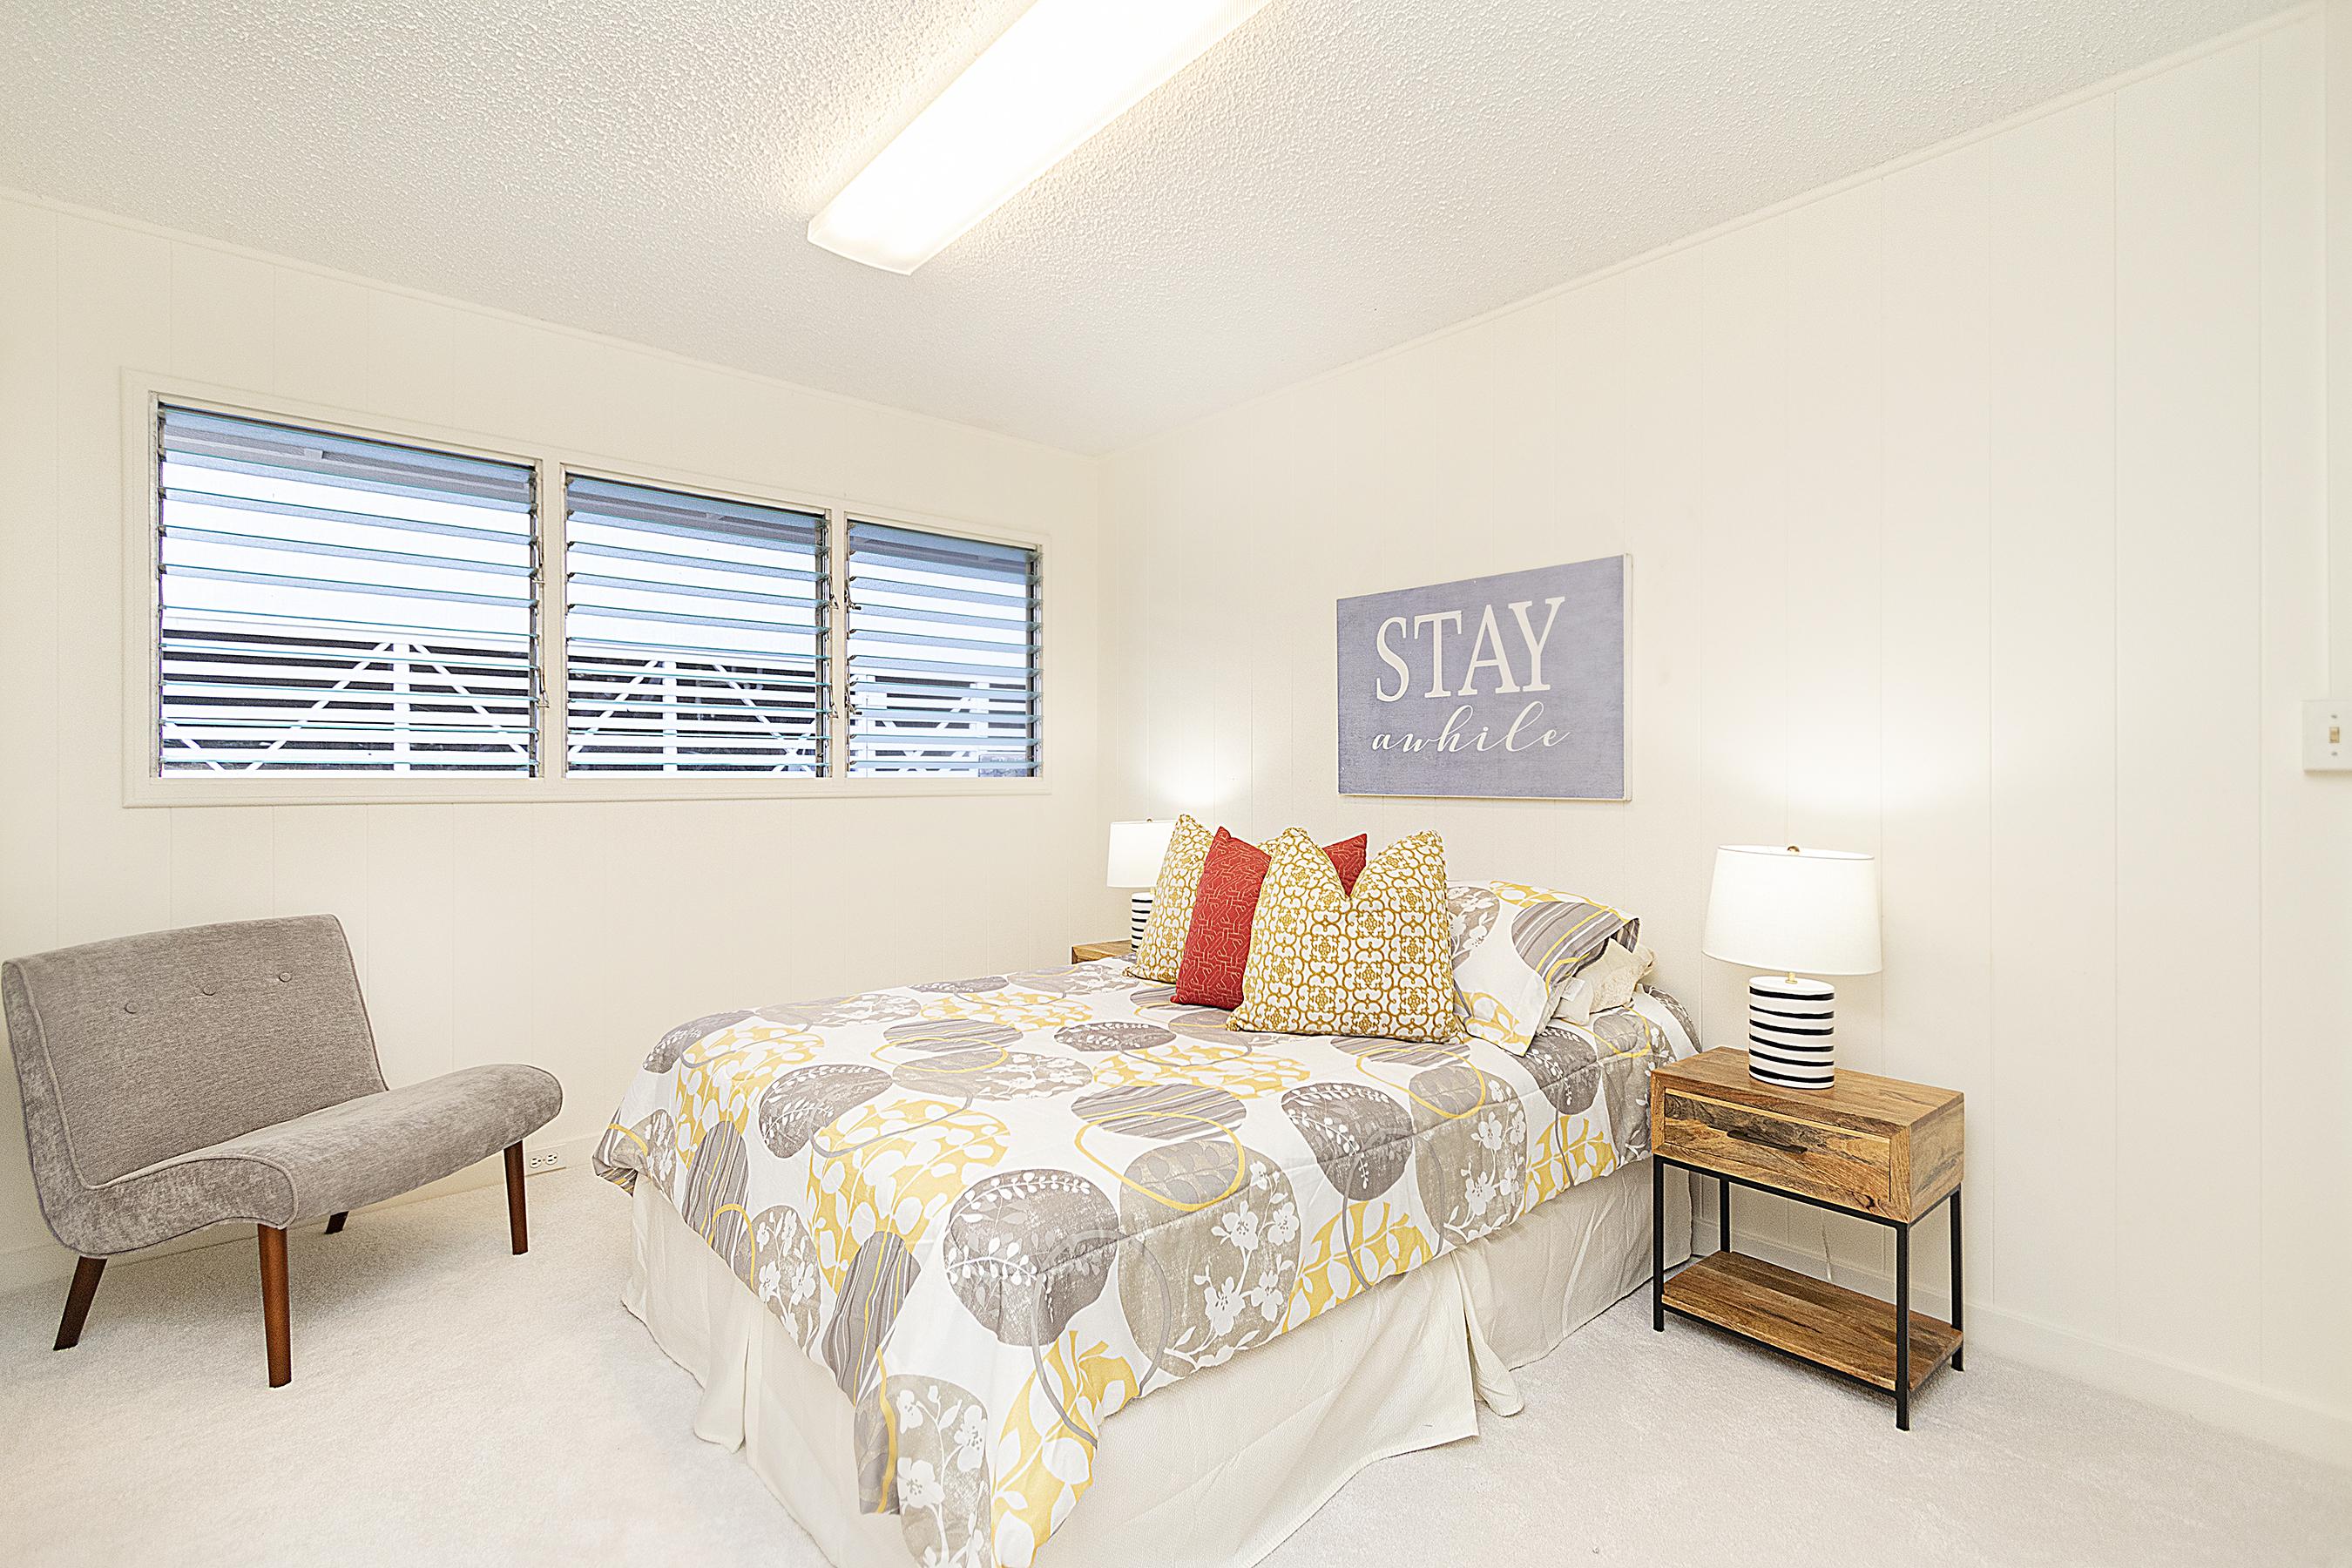 Second Bedroom at 380 Puiwa Road, Honolulu, HI 96817